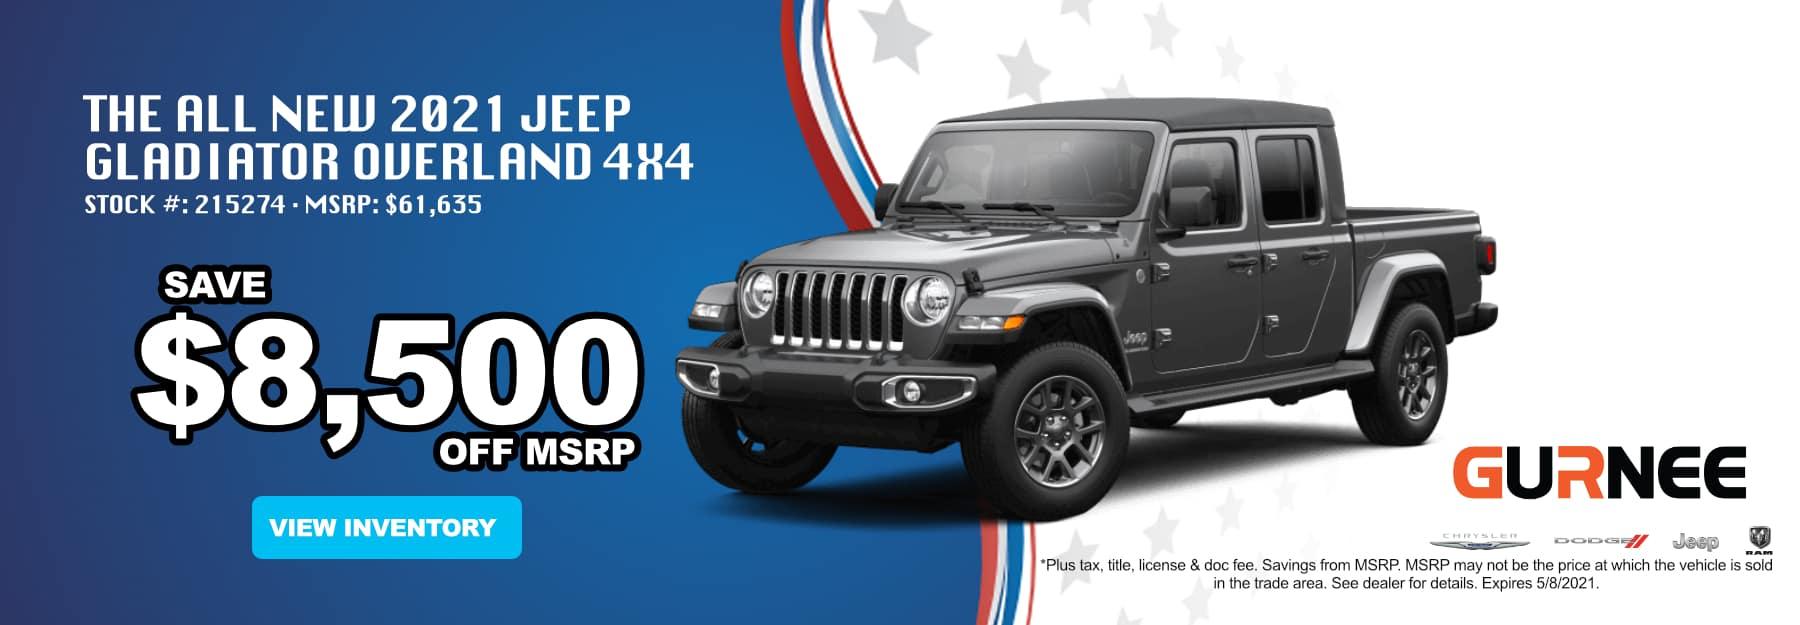 April_2021 Jeep Gladiator_Gurnee